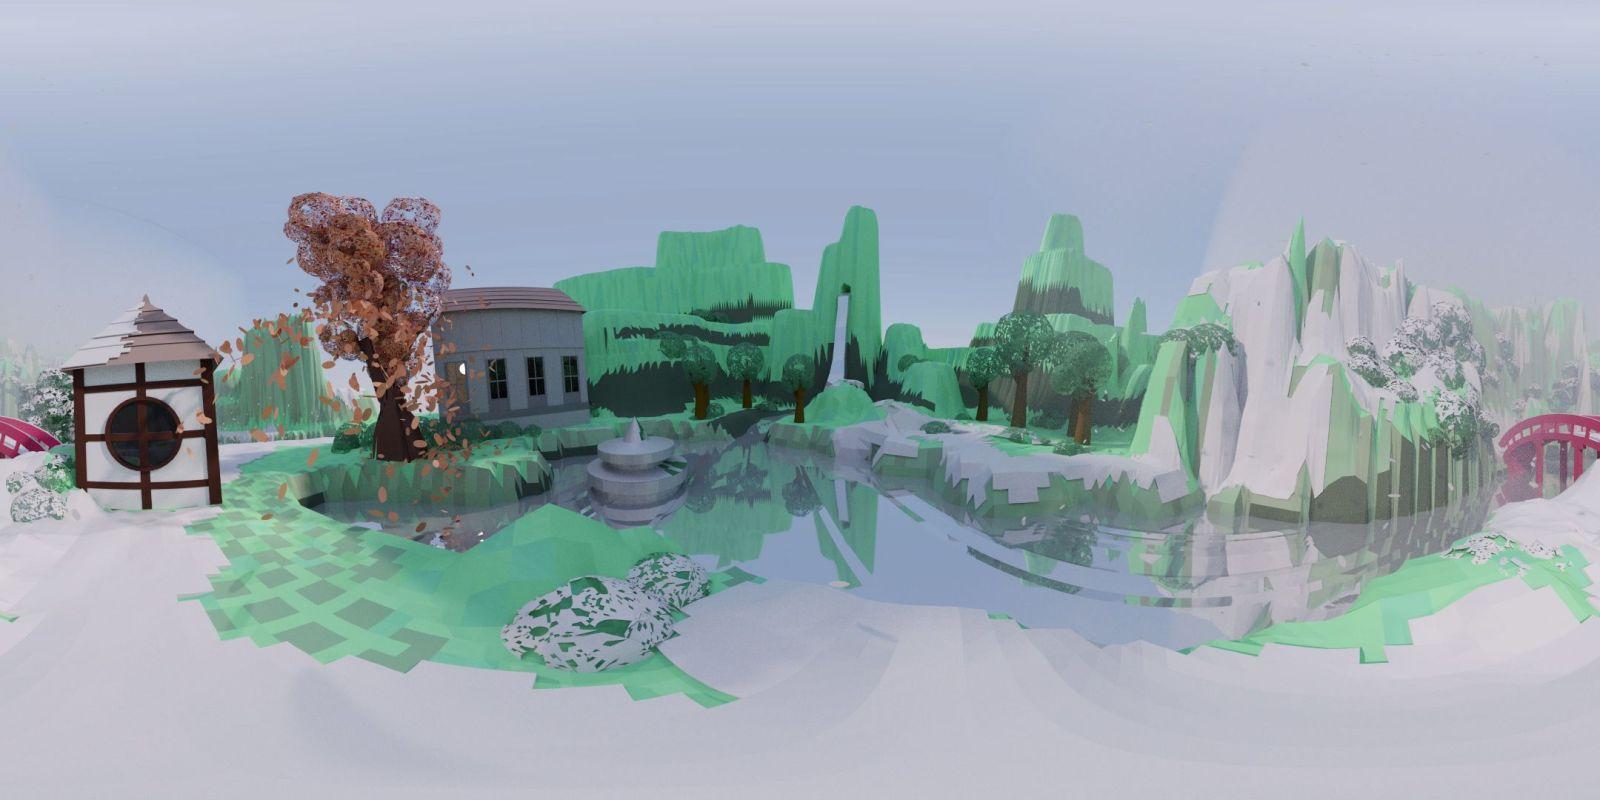 Blender Tutorial: How to Render a 3D VR Video from Blender